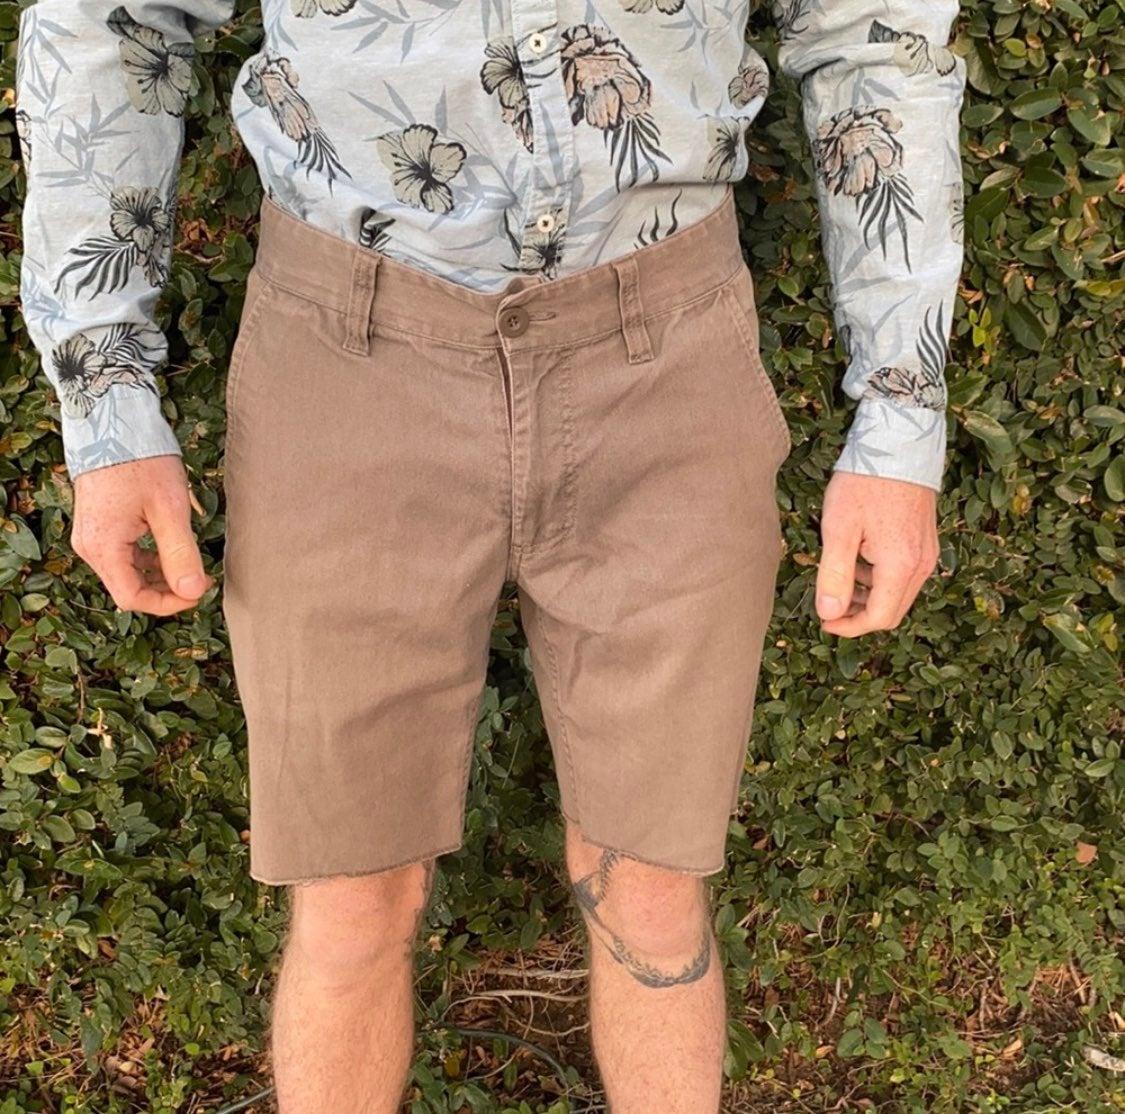 Brixton men's shorts size 30